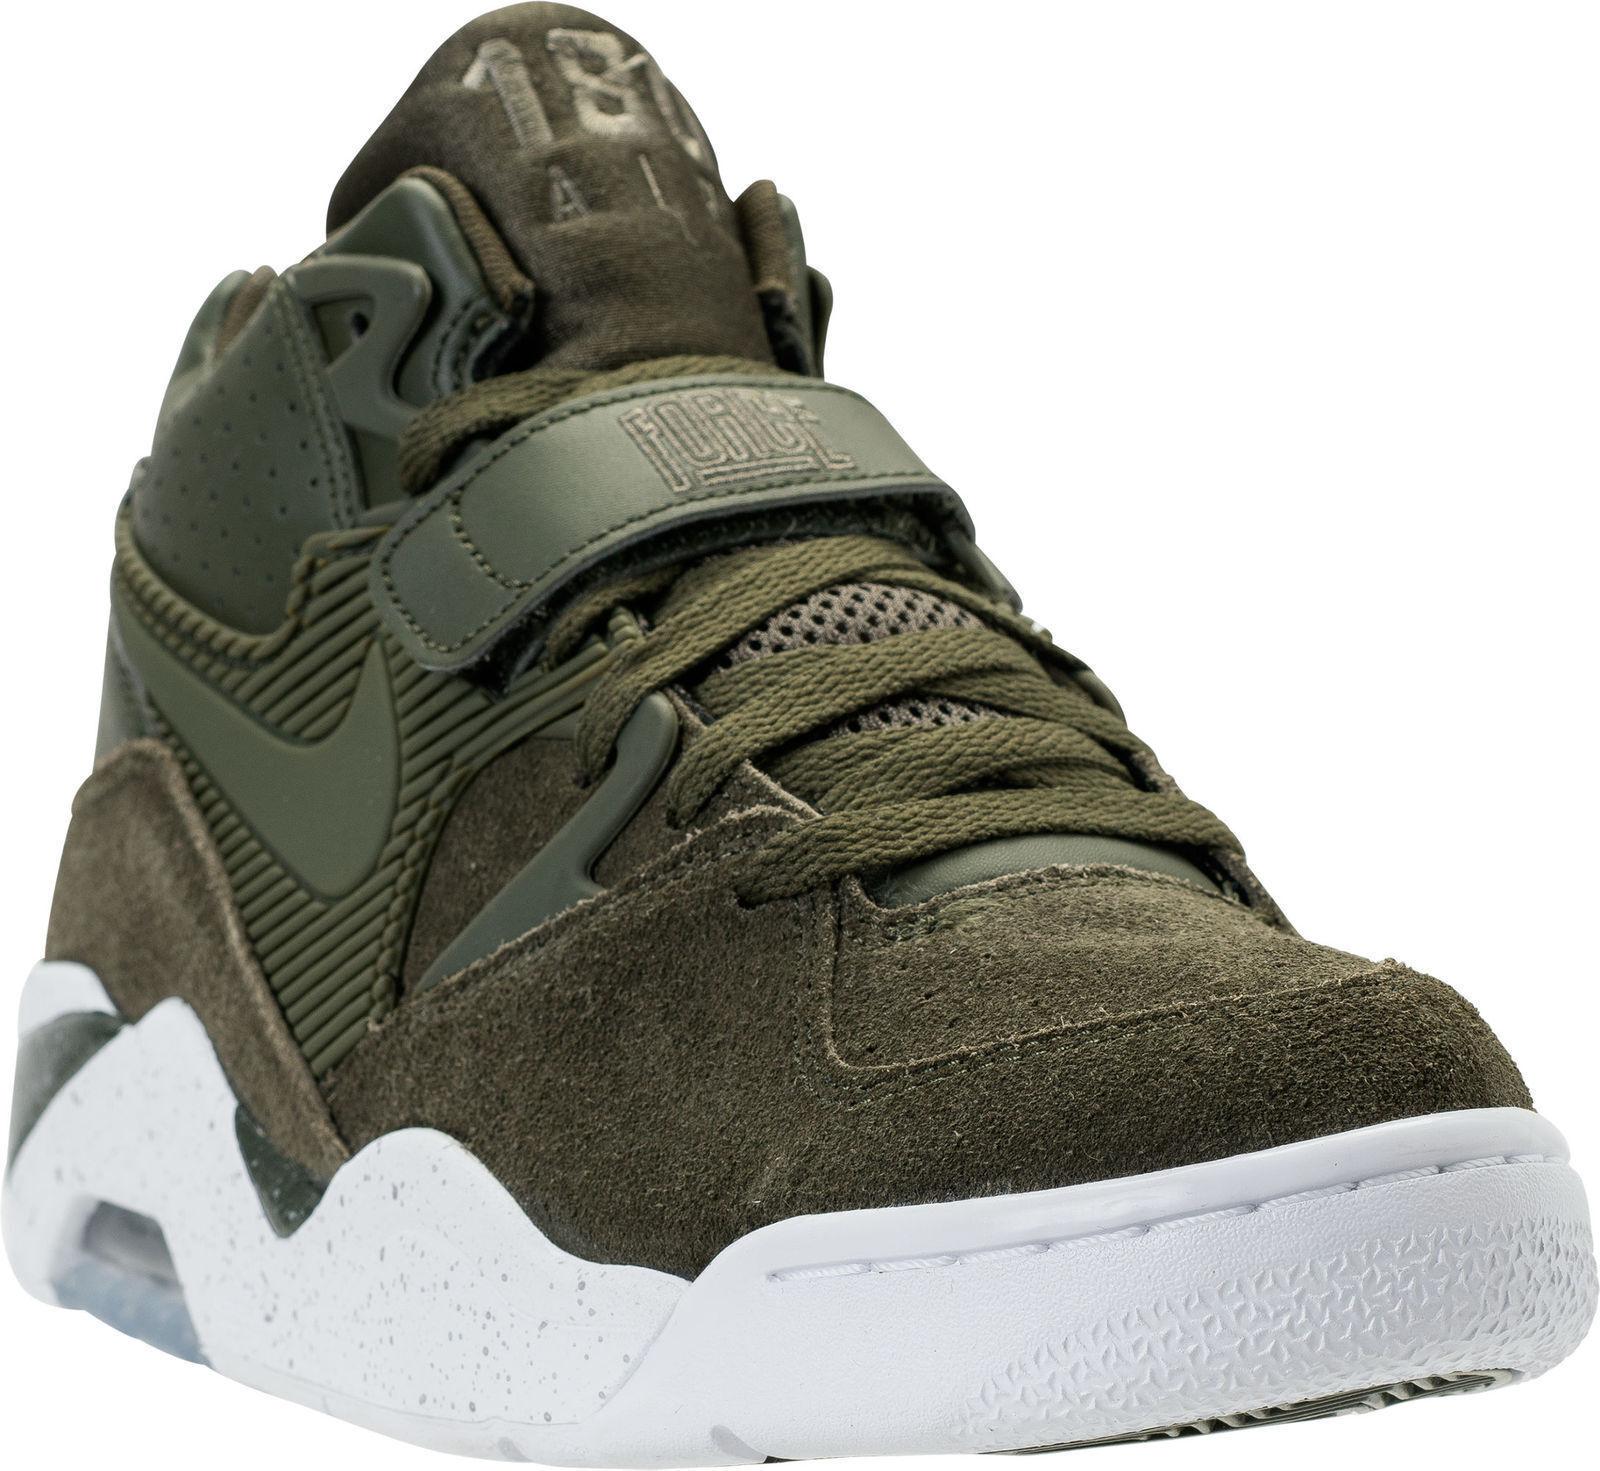 Nike Air Force 180 Men's Basketball shoes Sz 12.5 Cargo Khaki White 310095 300